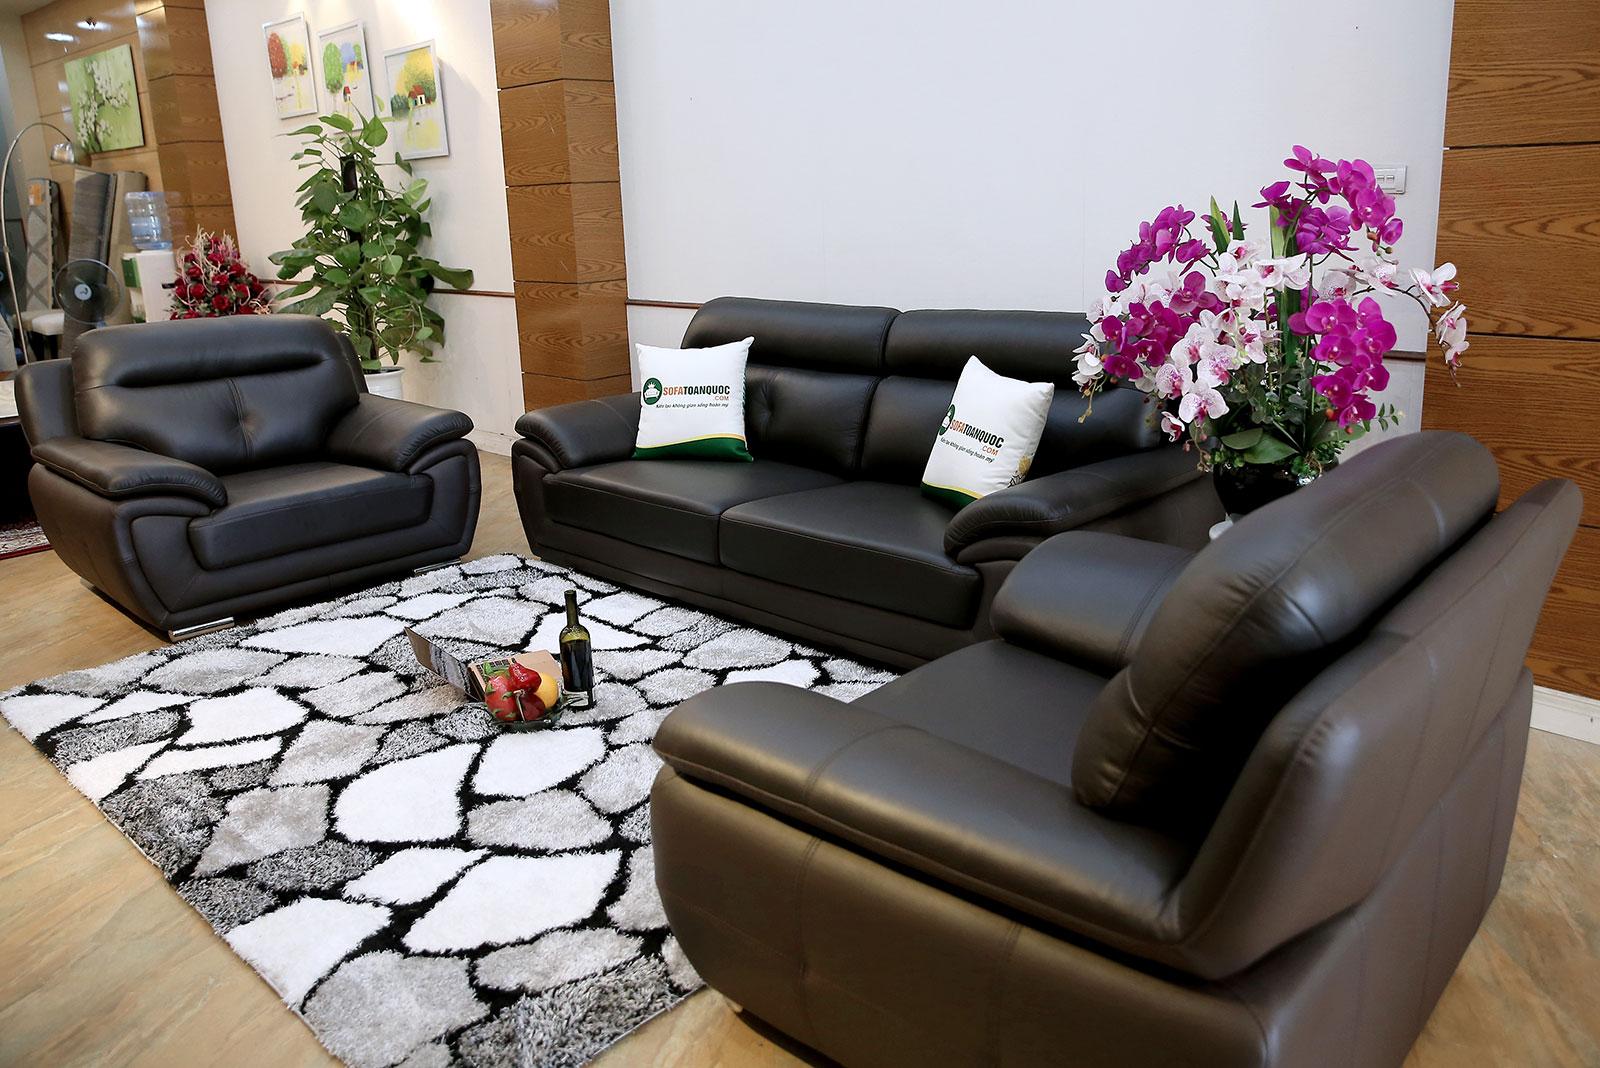 Bộ sofa da thật đẹp mã m17